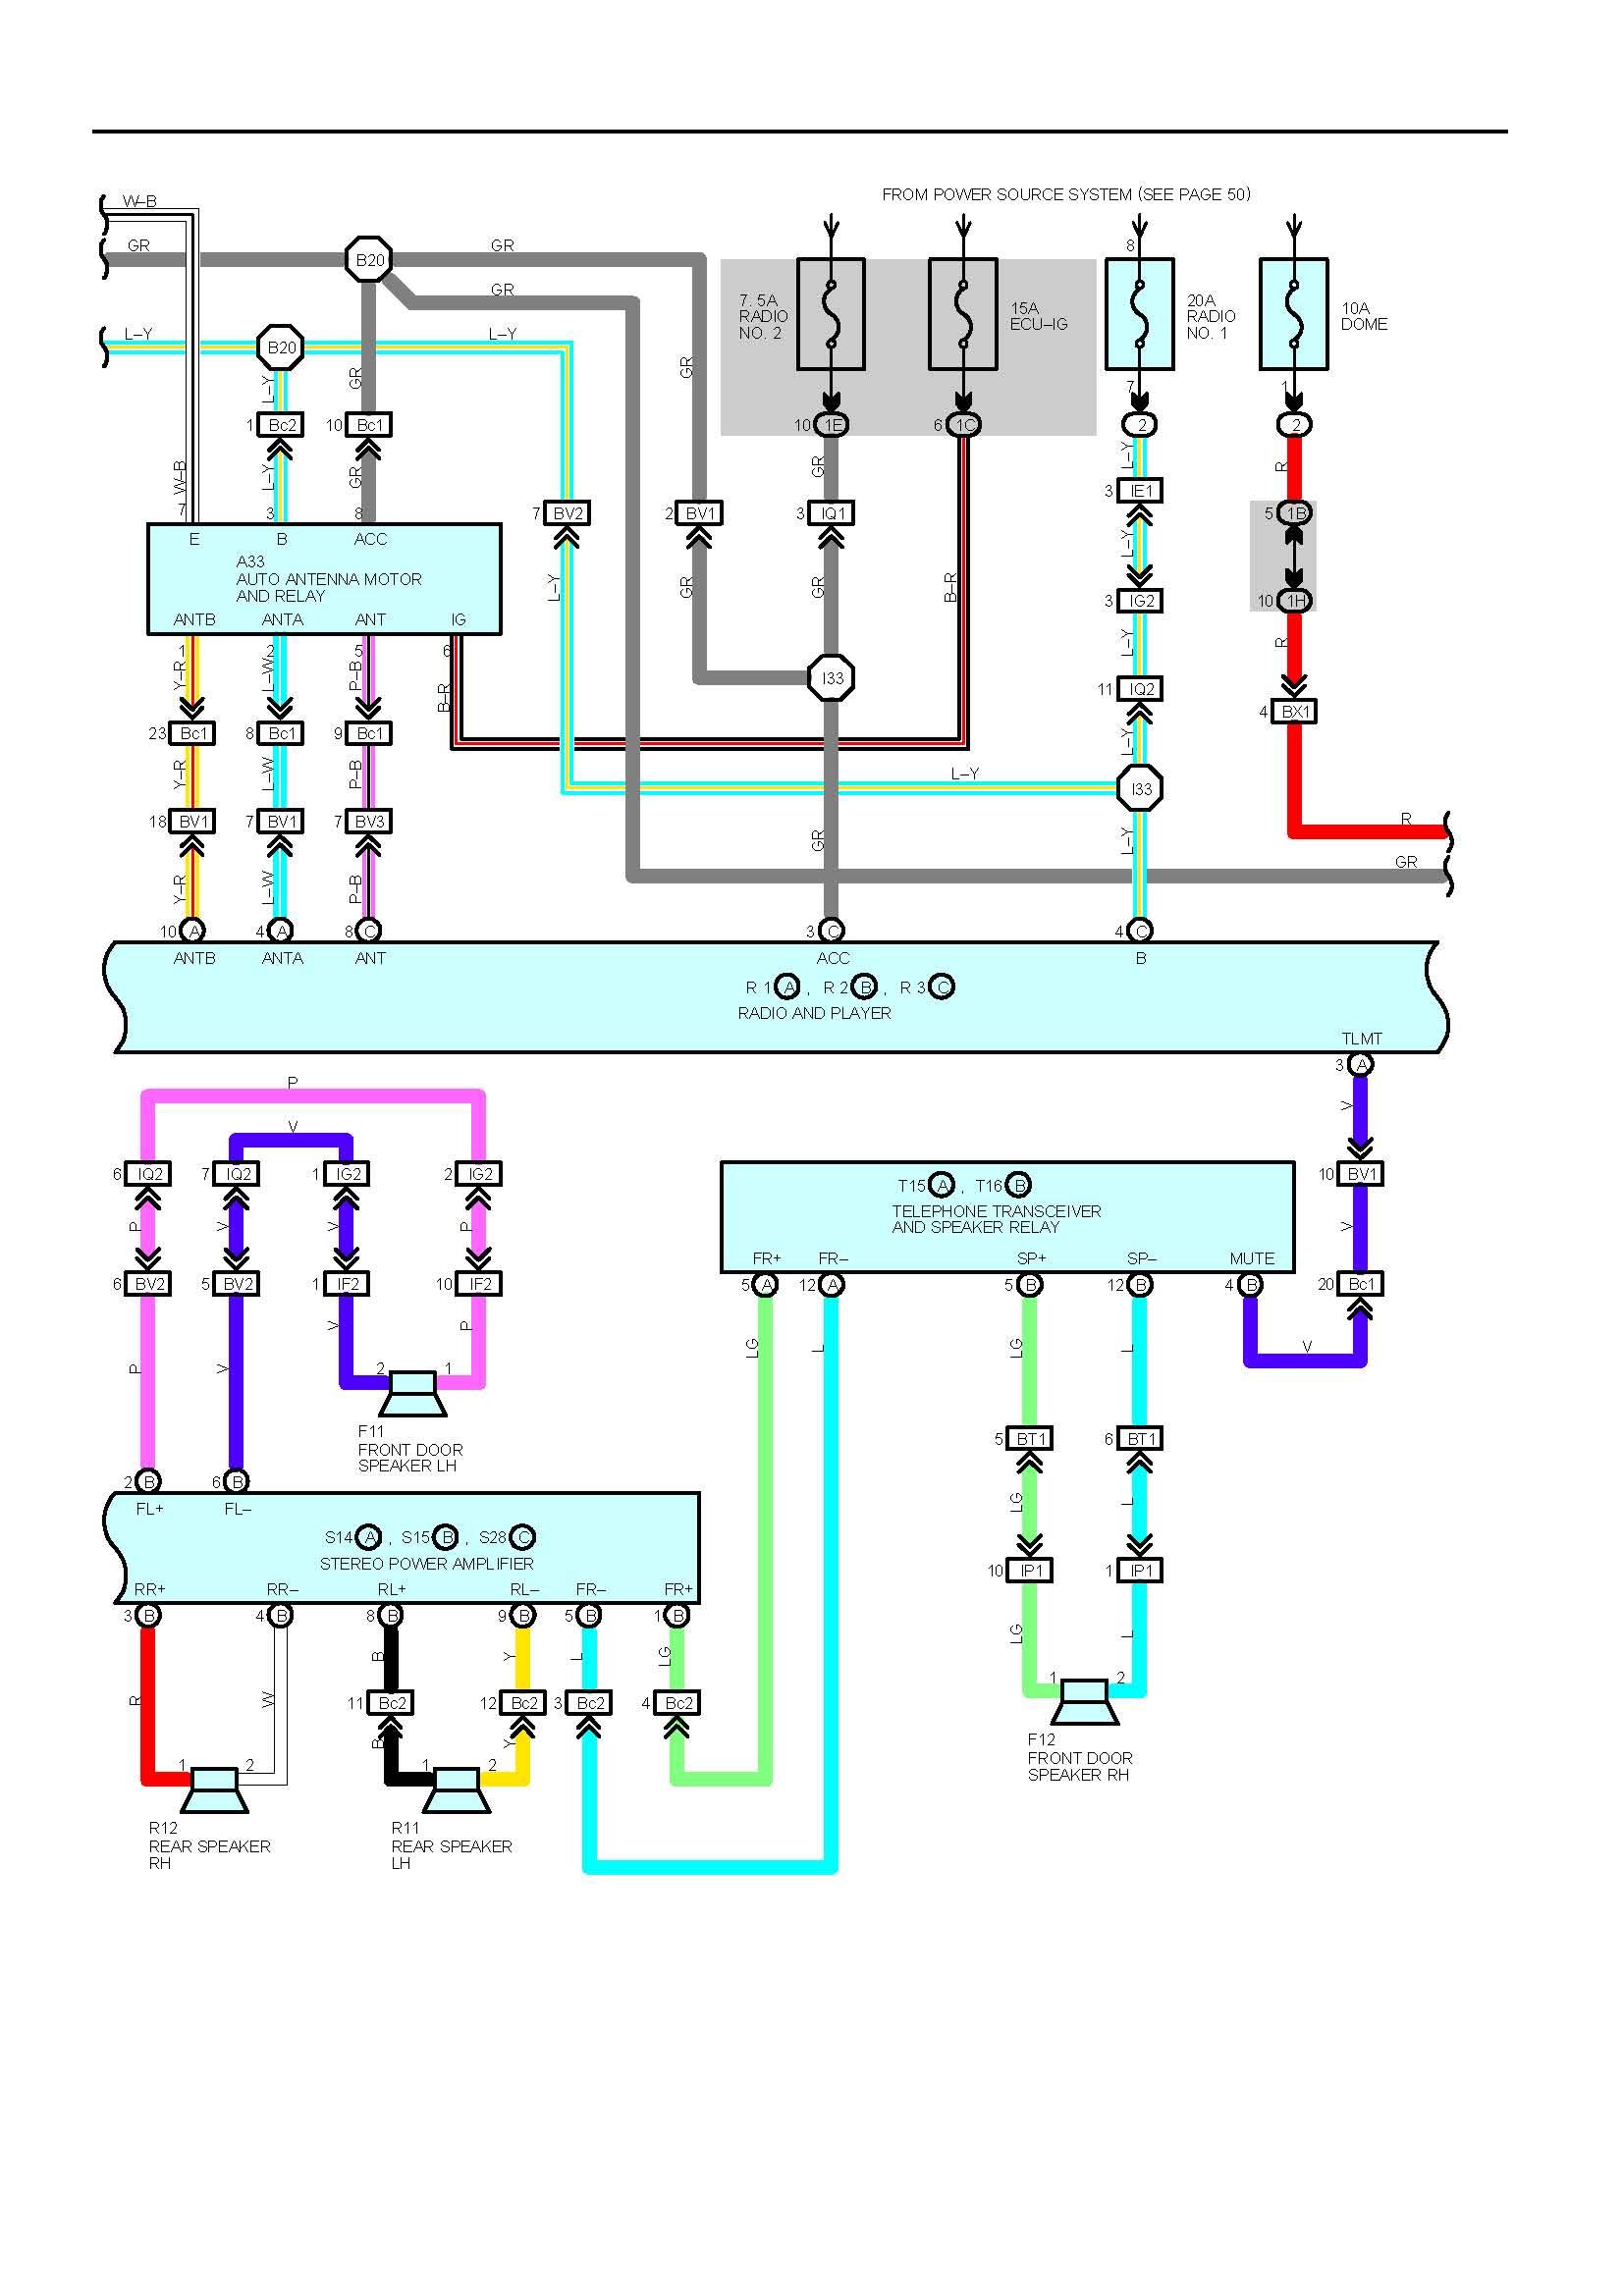 WG_2783] 1990 Lexus Ls400 Radio Circuit And Wiring Diagram Free DiagramIlari Viewor Mohammedshrine Librar Wiring 101